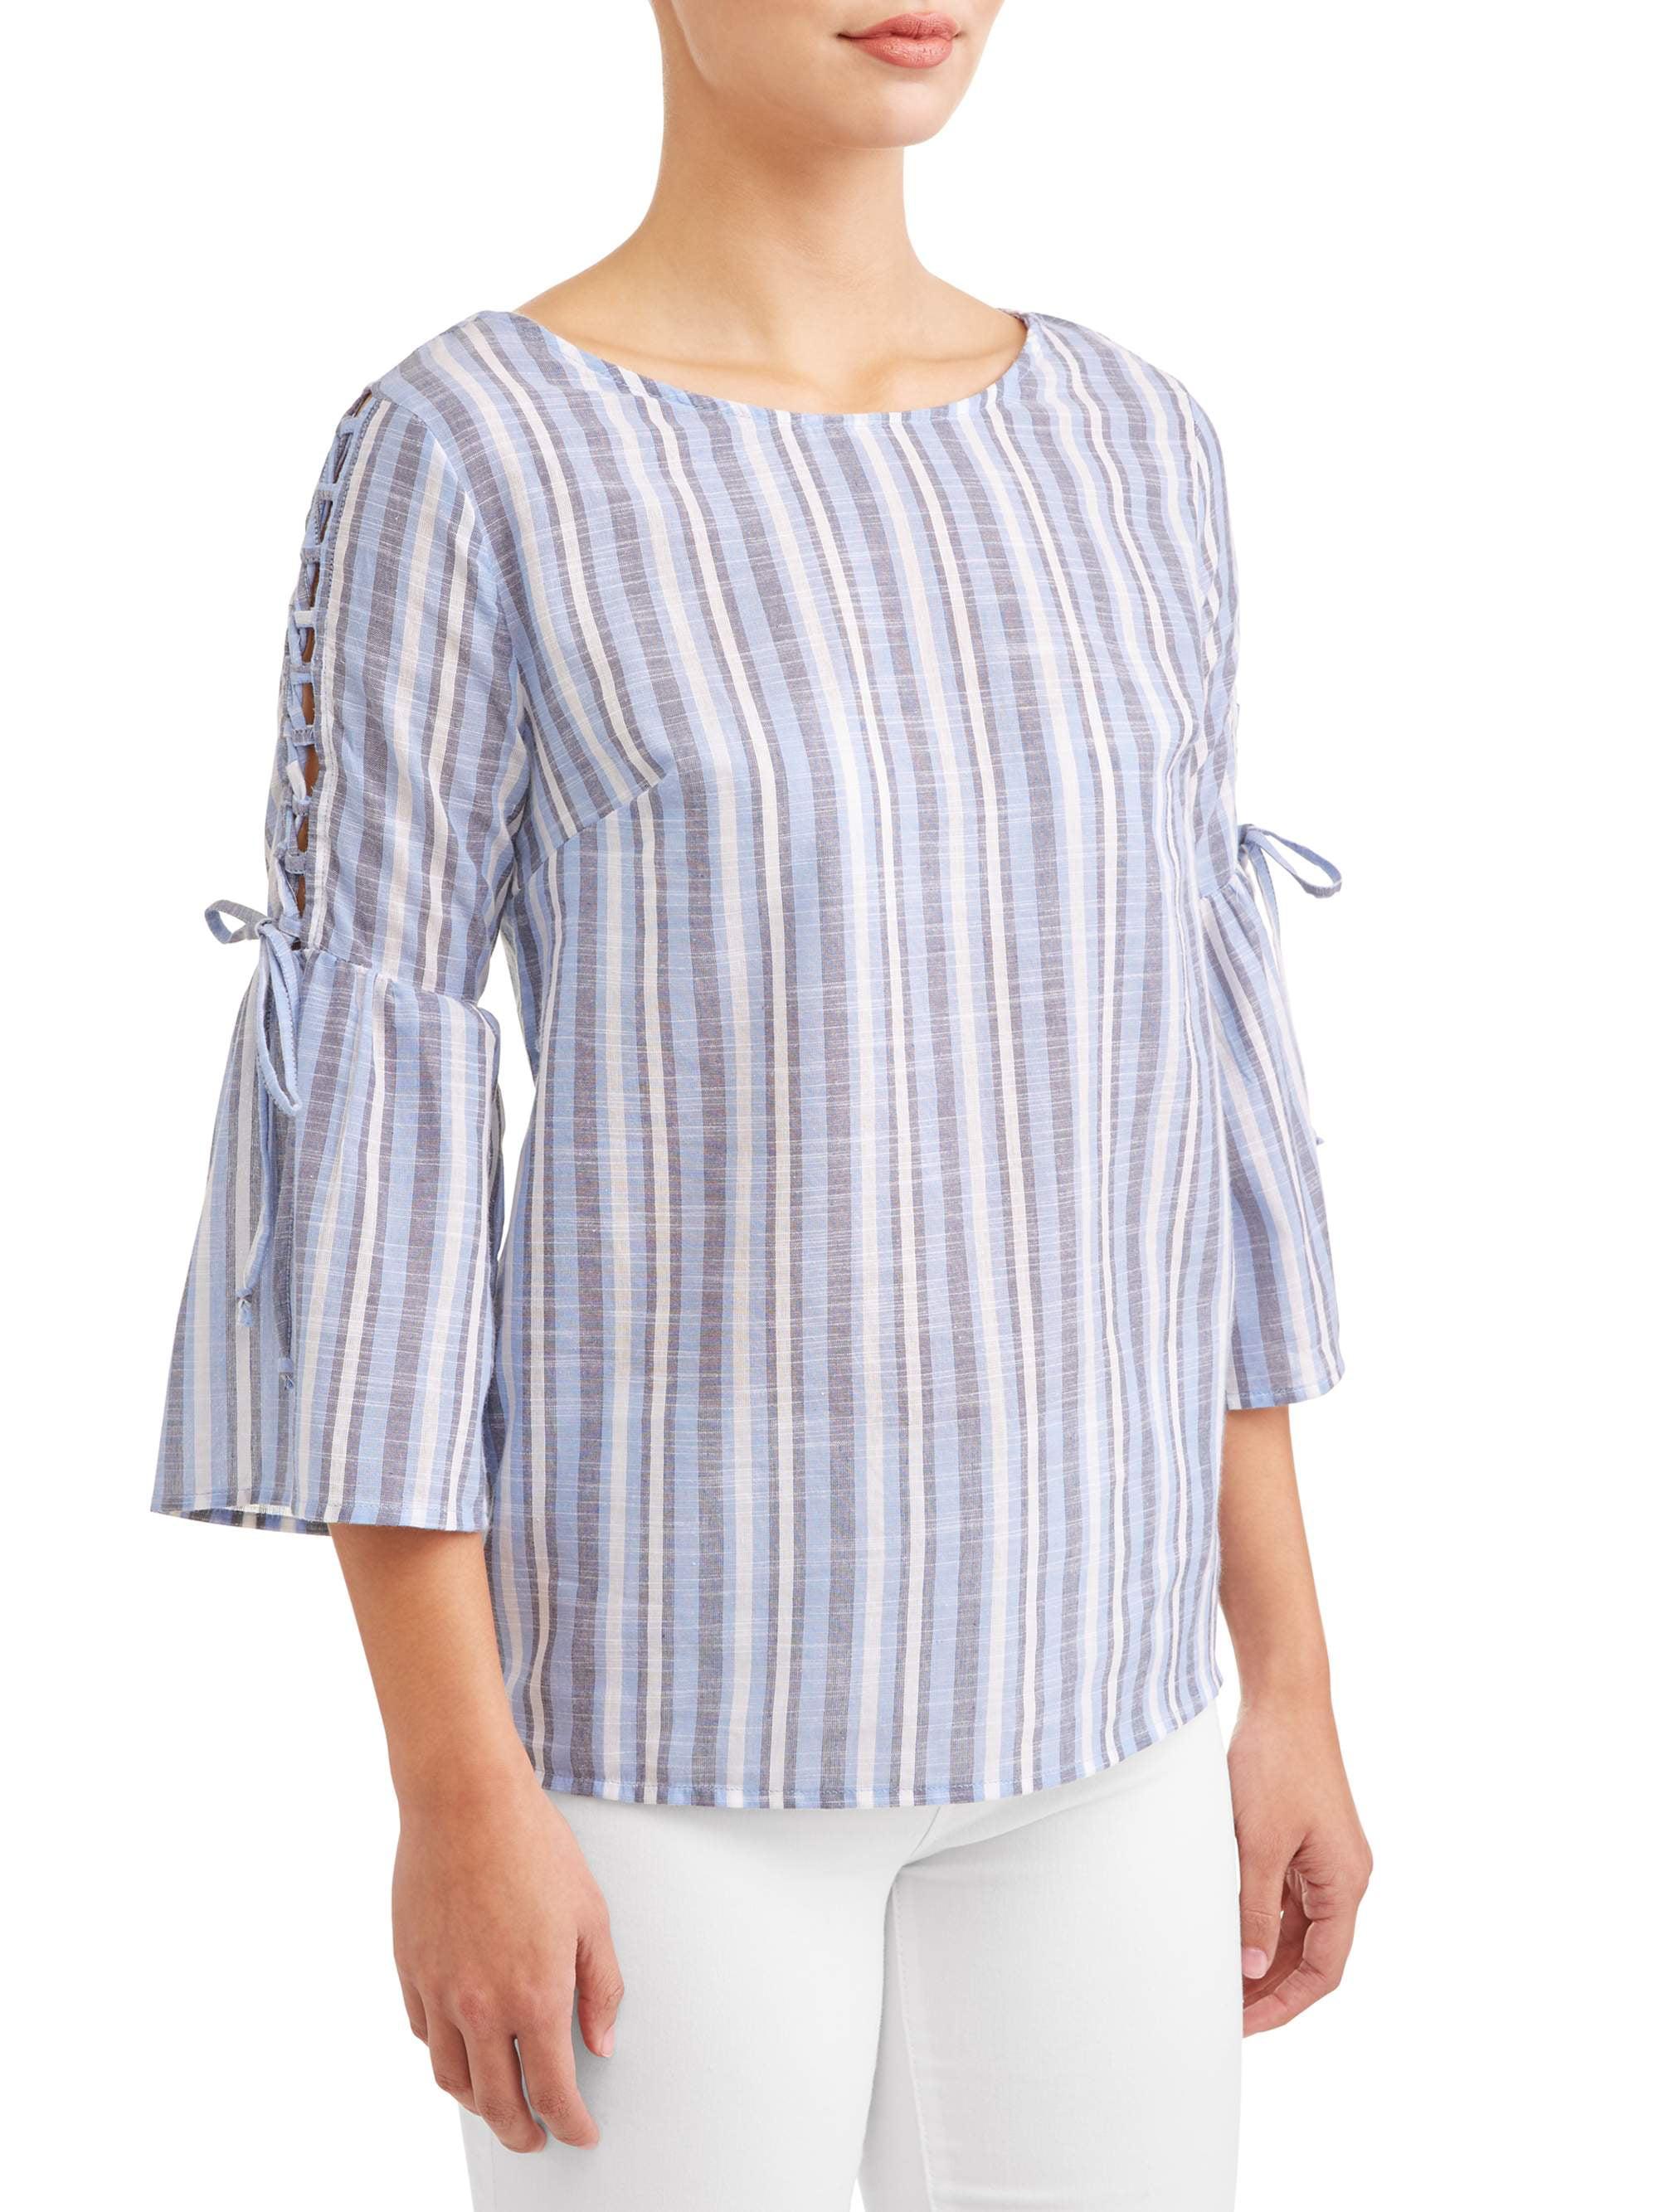 Women's Bell Sleeve Lace Up Stripe Top